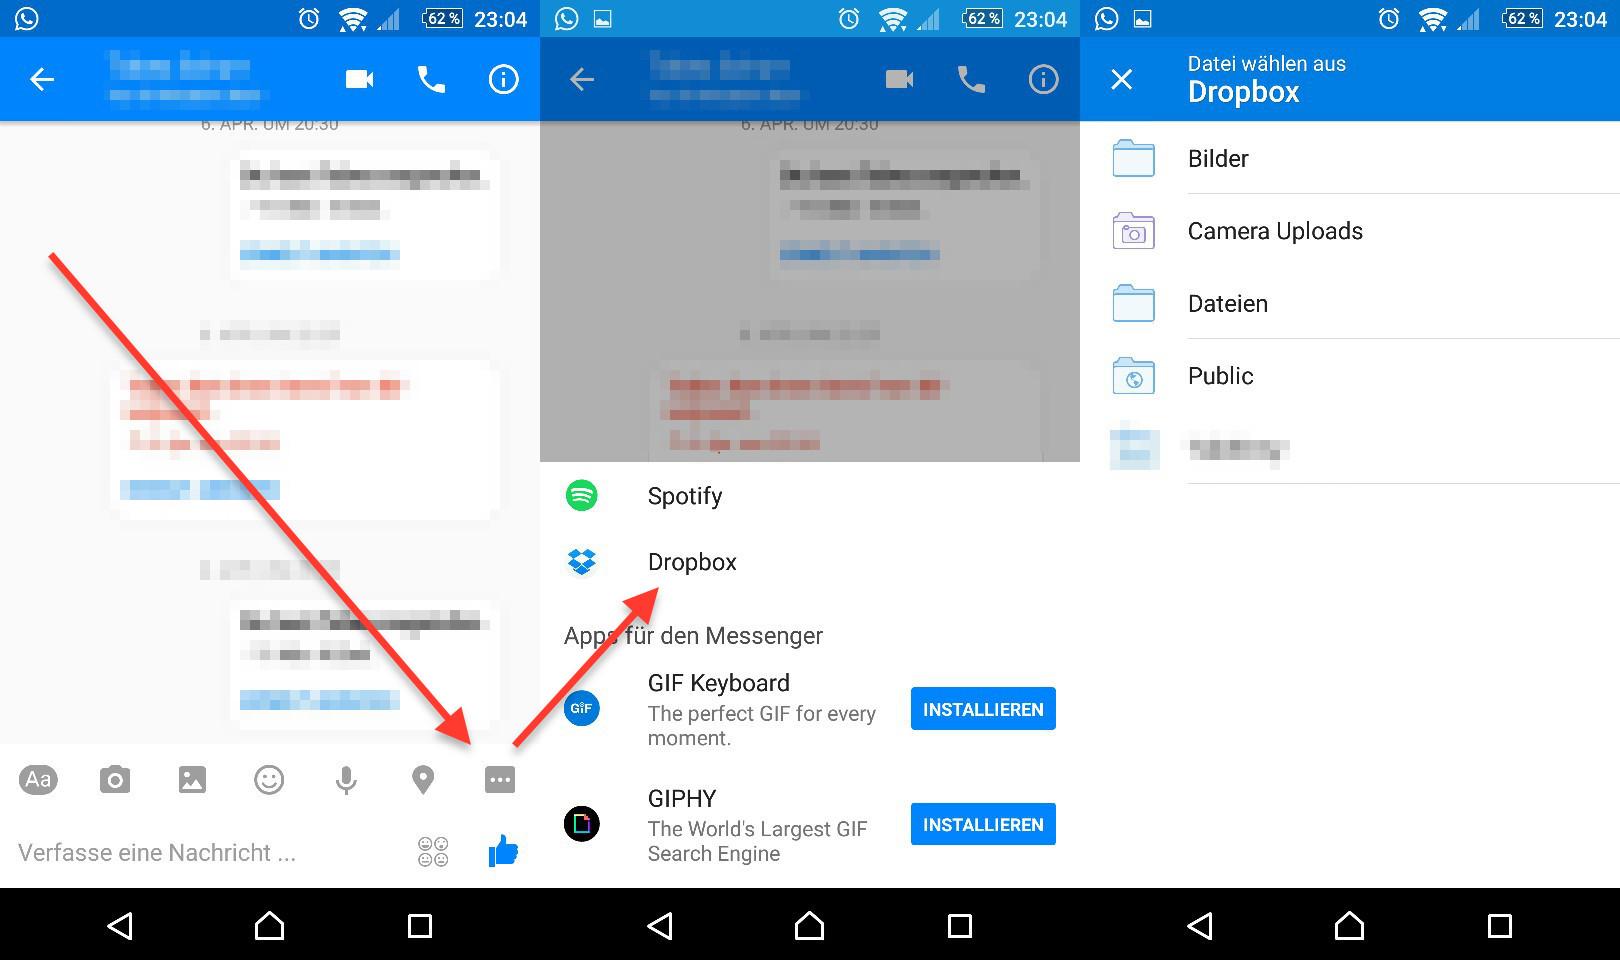 Facebook Messenger - Direkter Zugriff auf Dropbox